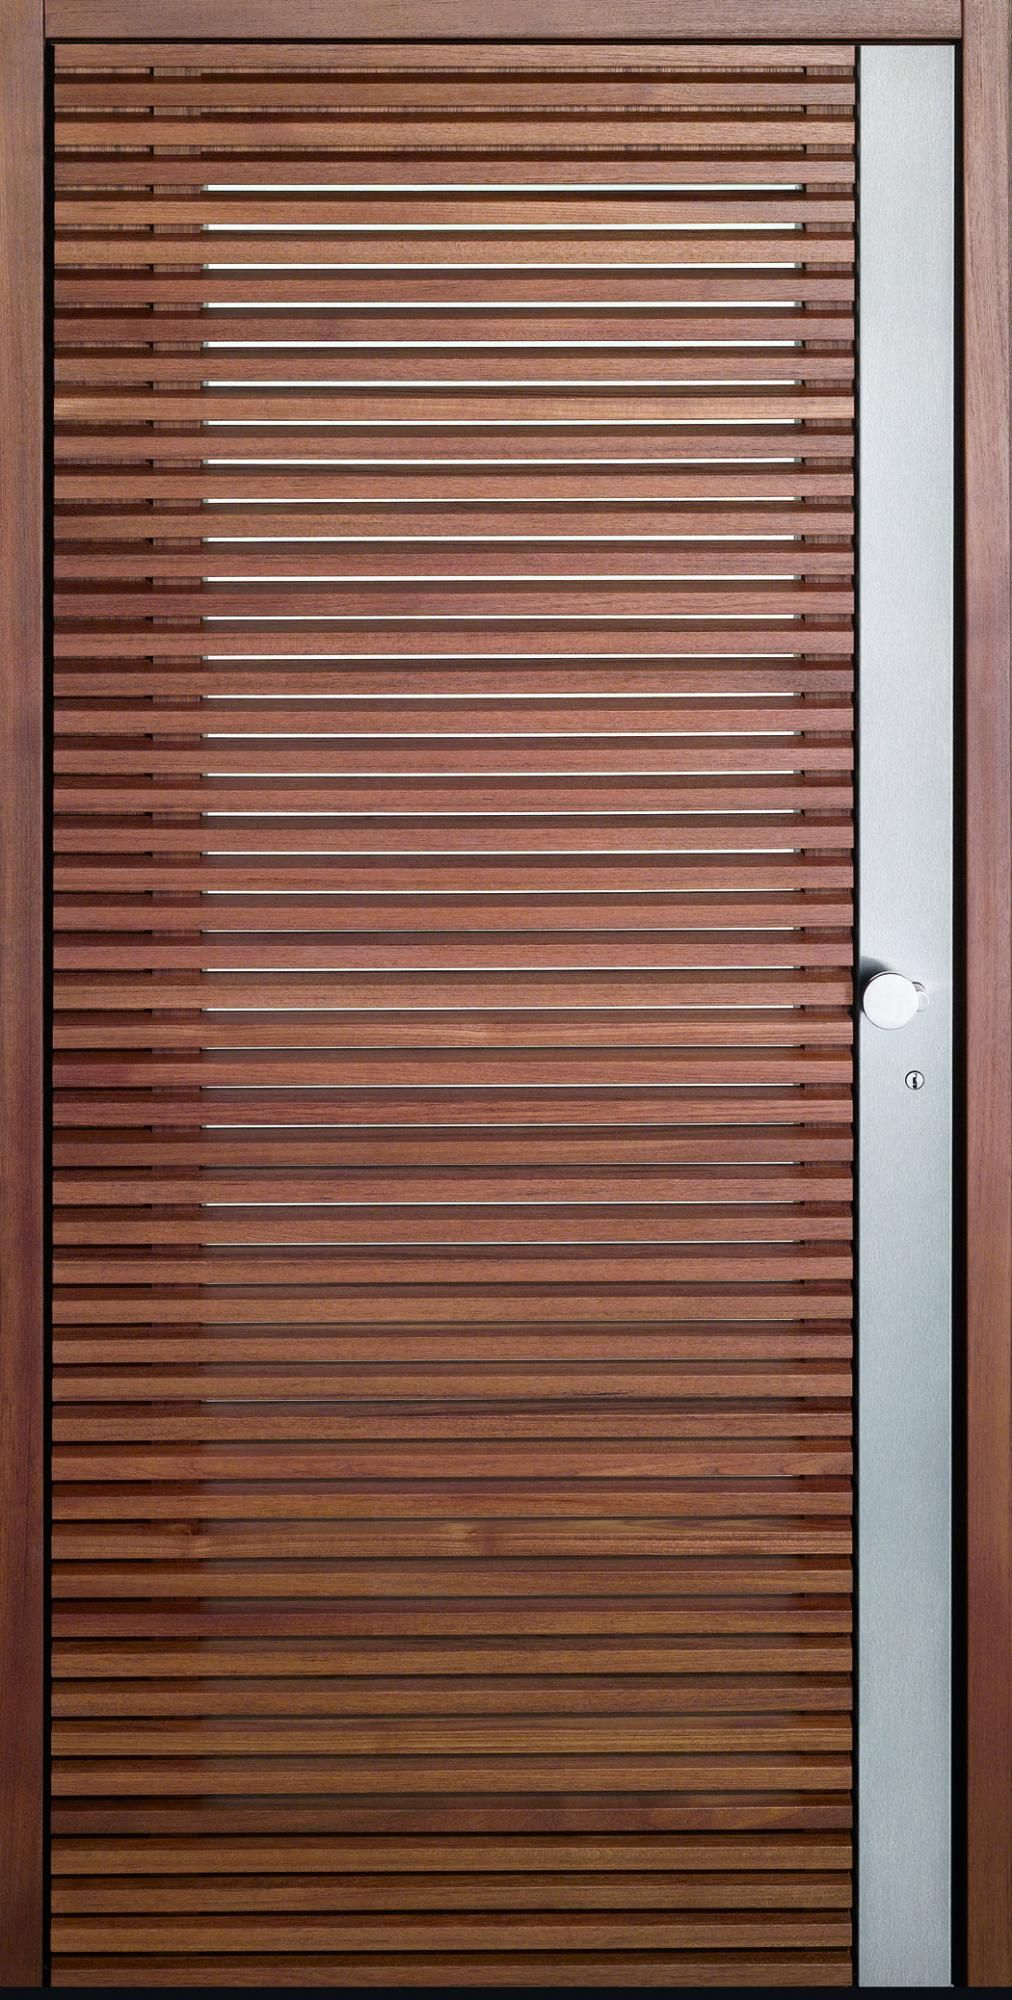 Haustür front door Current Daylight T3 www.topic.at | House - Doors ...